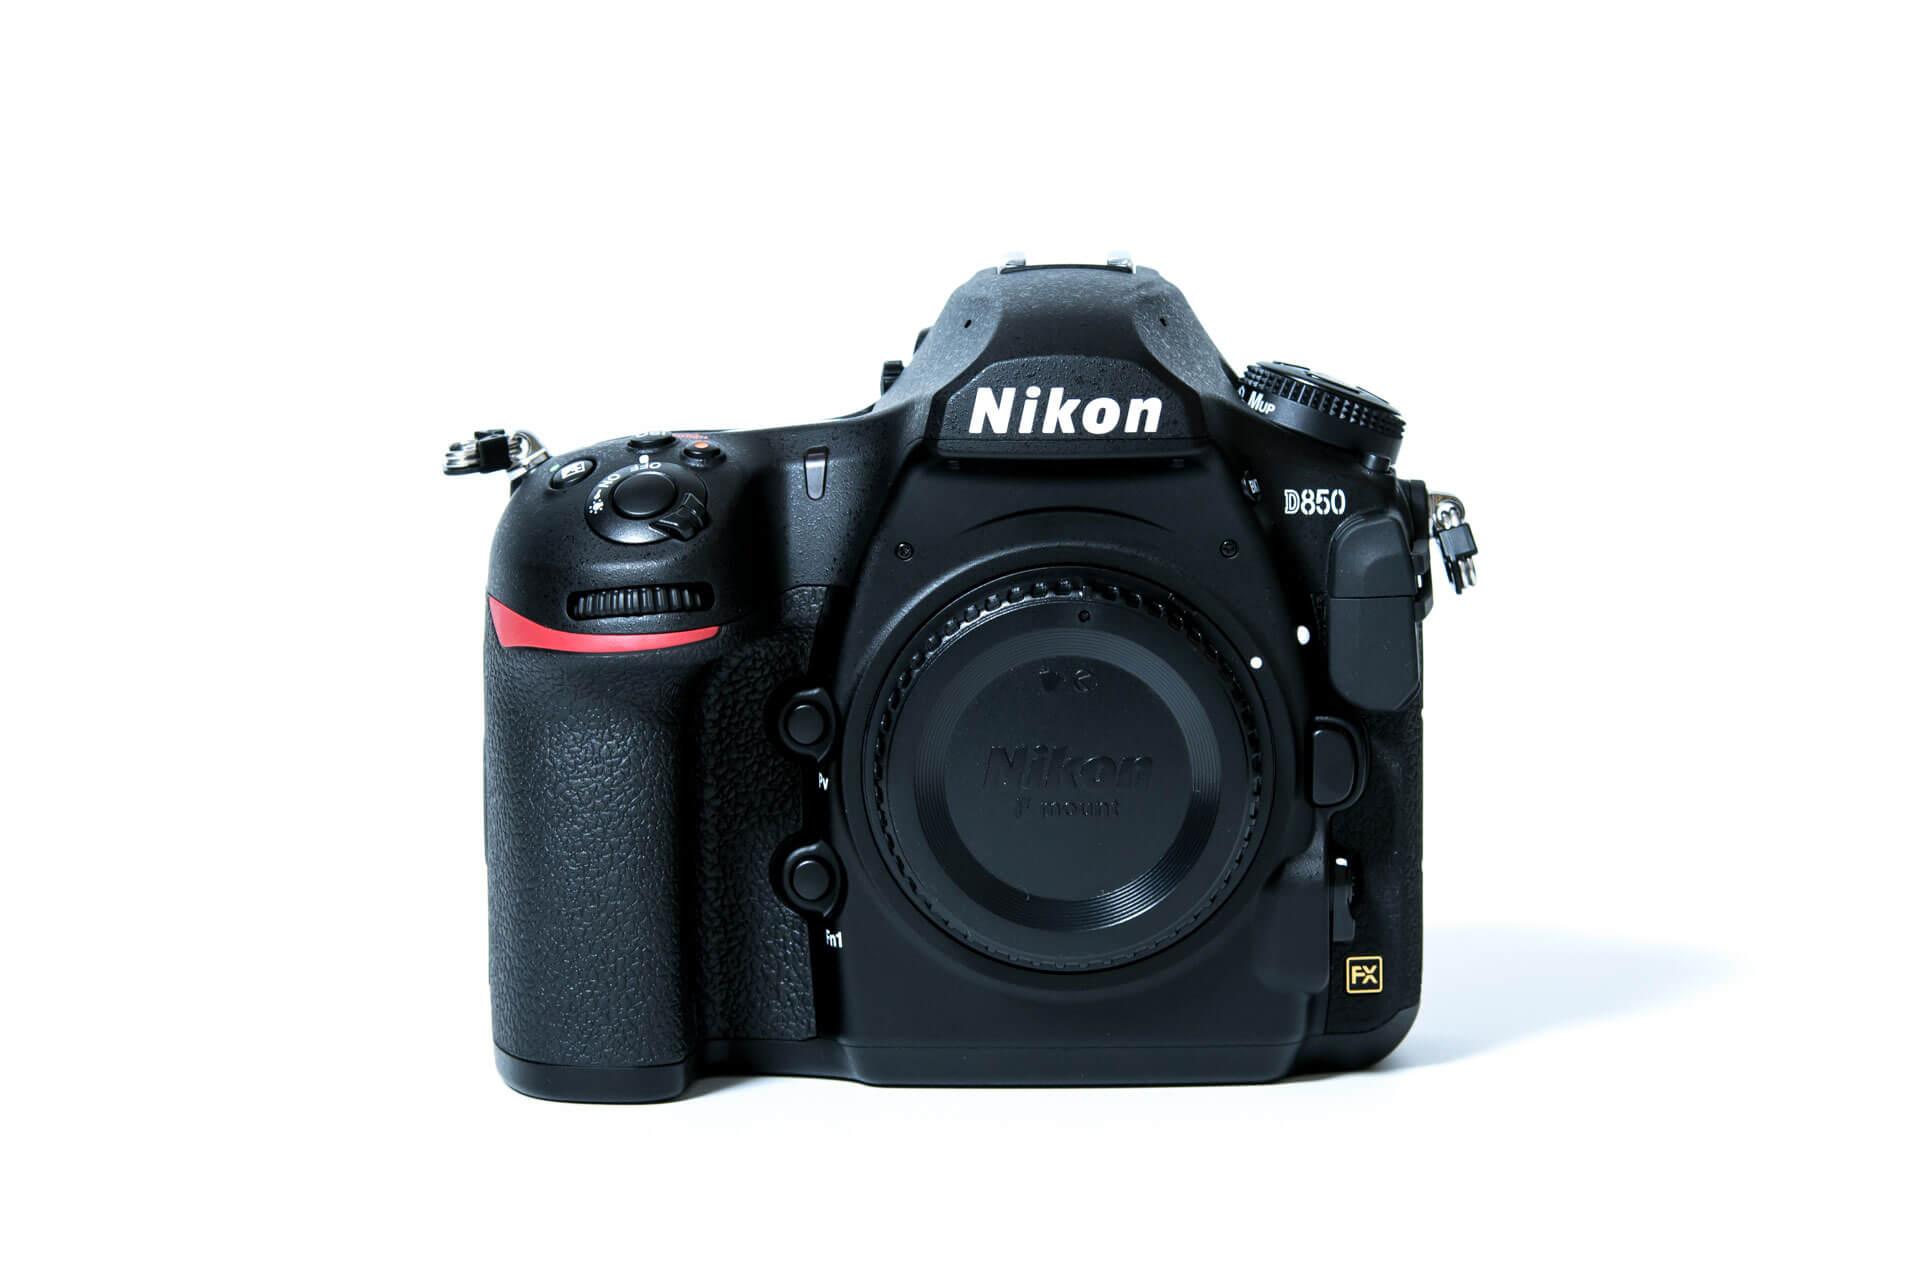 Nikon(ニコン) D850 レビュー